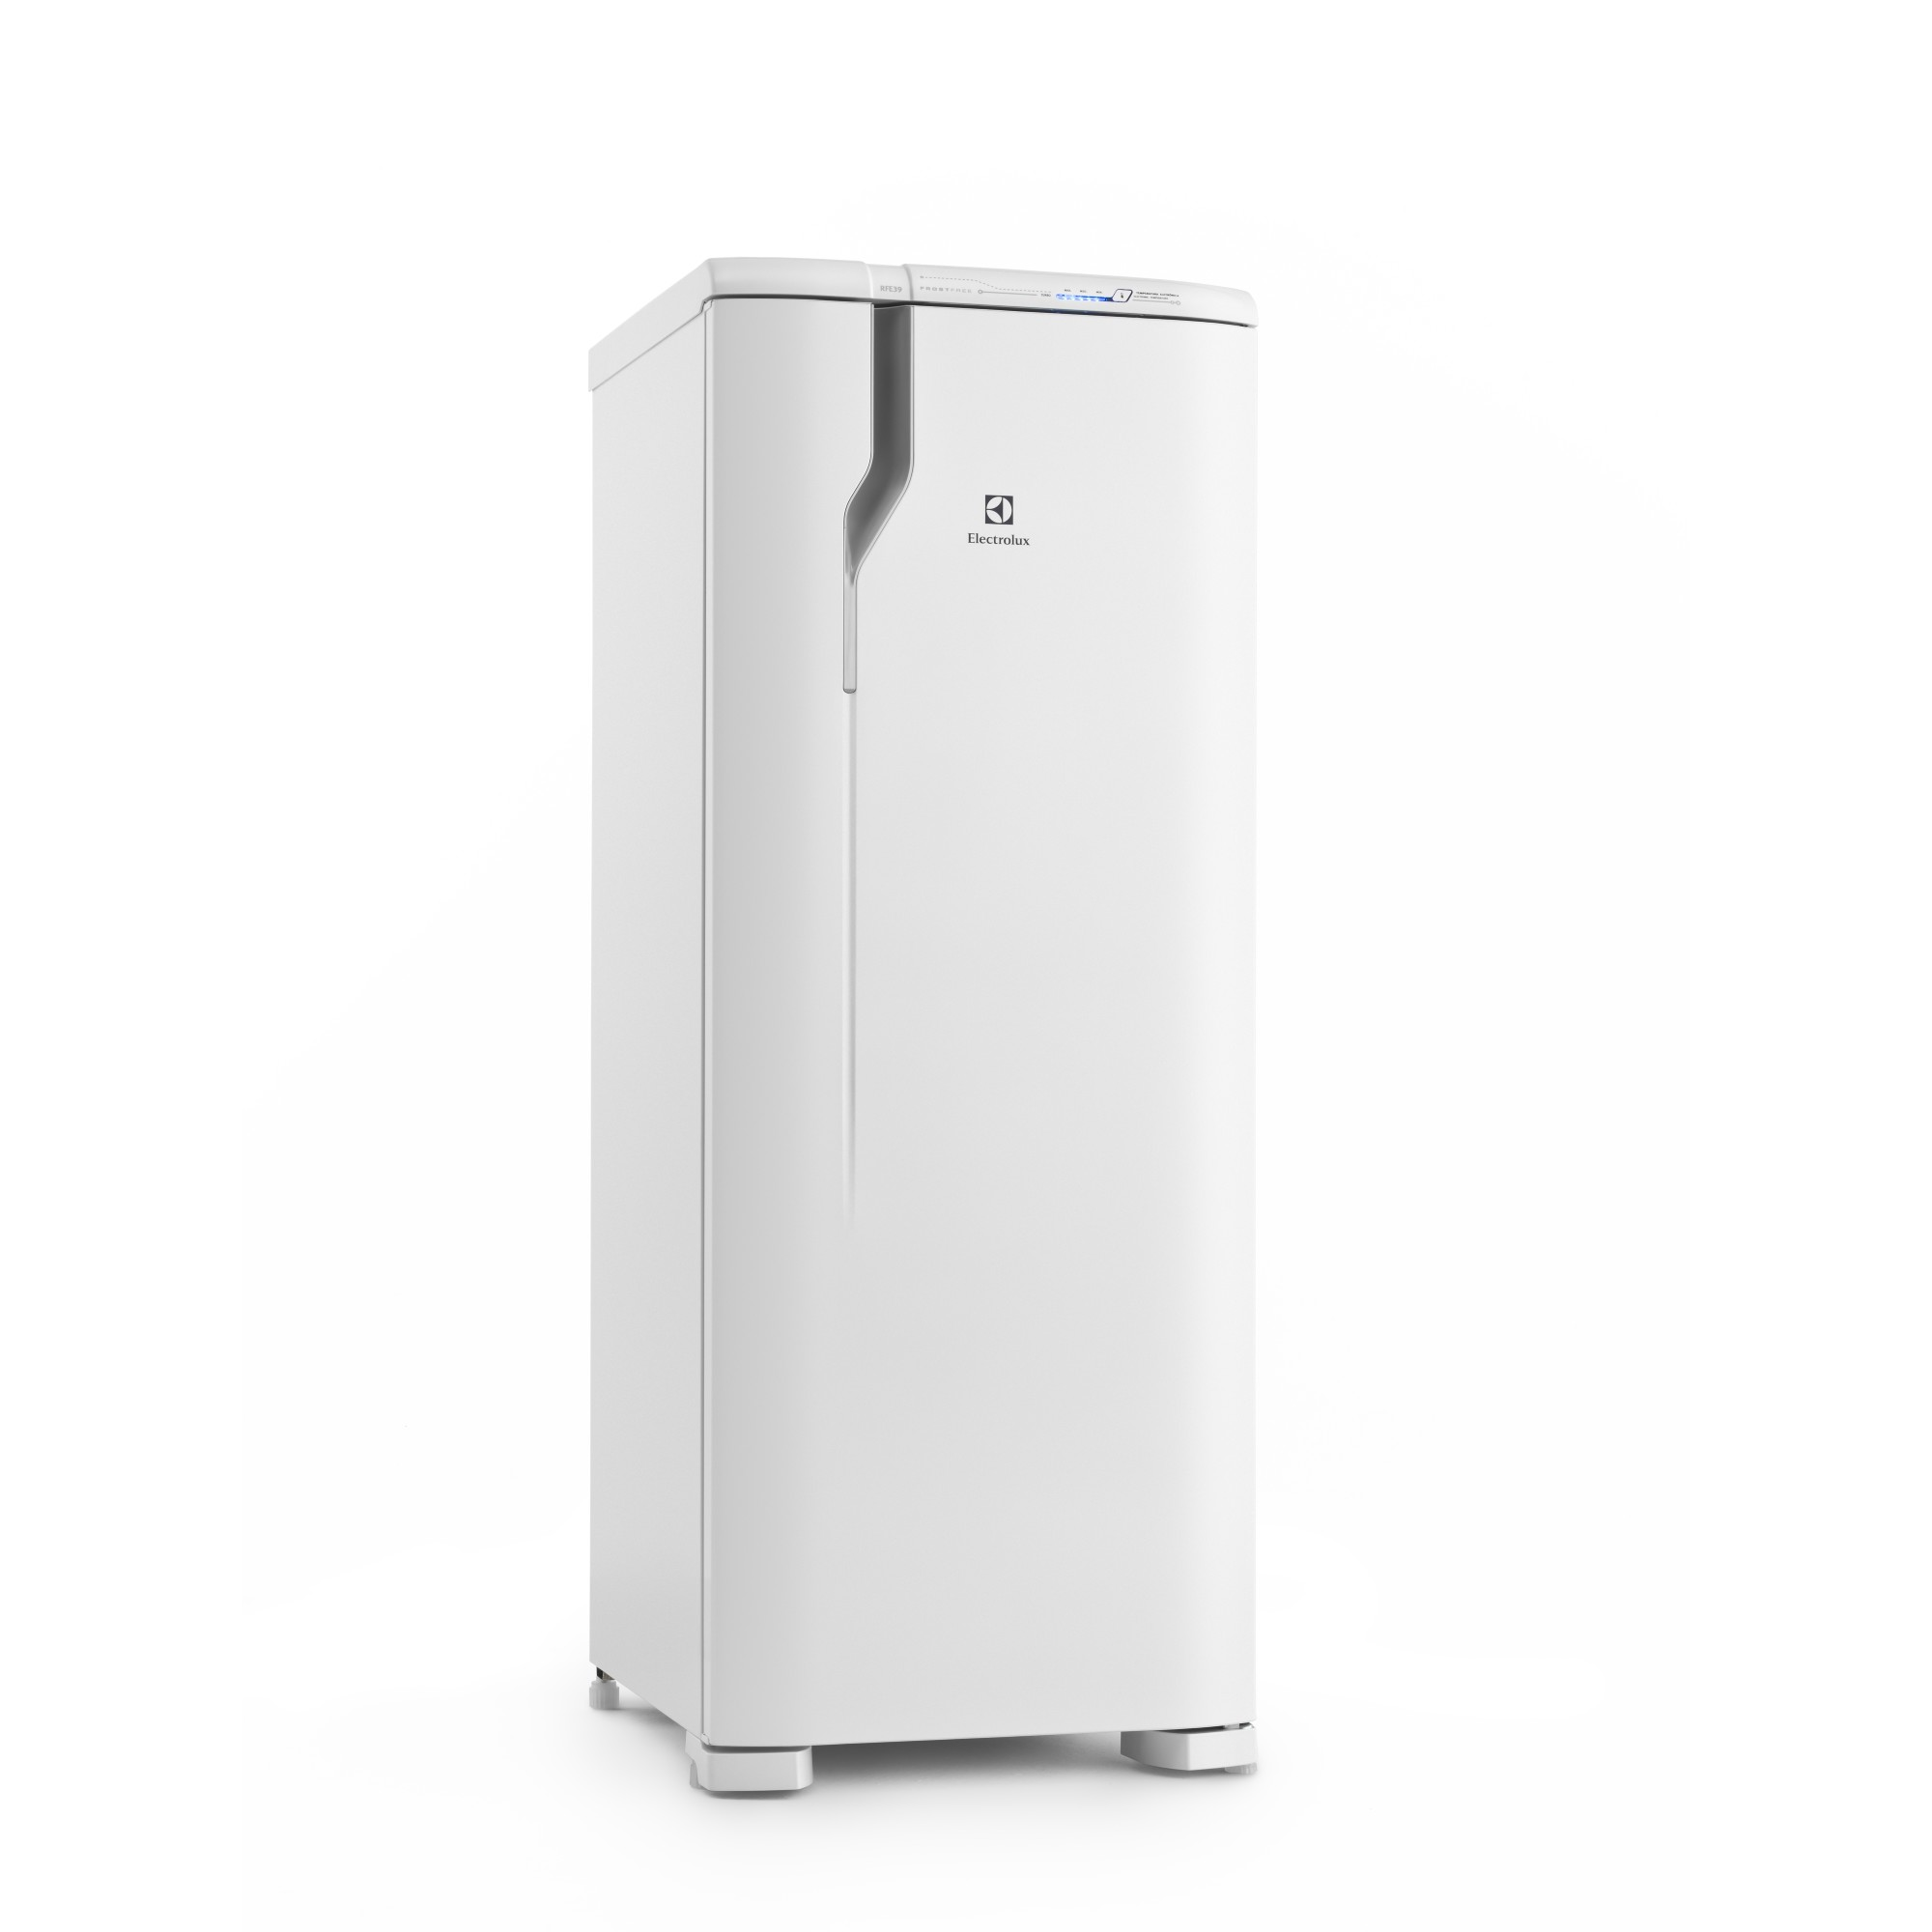 GeladeiraRefrigerador Electrolux Frost Free 1 Porta 322L Branco 220V - RFE39